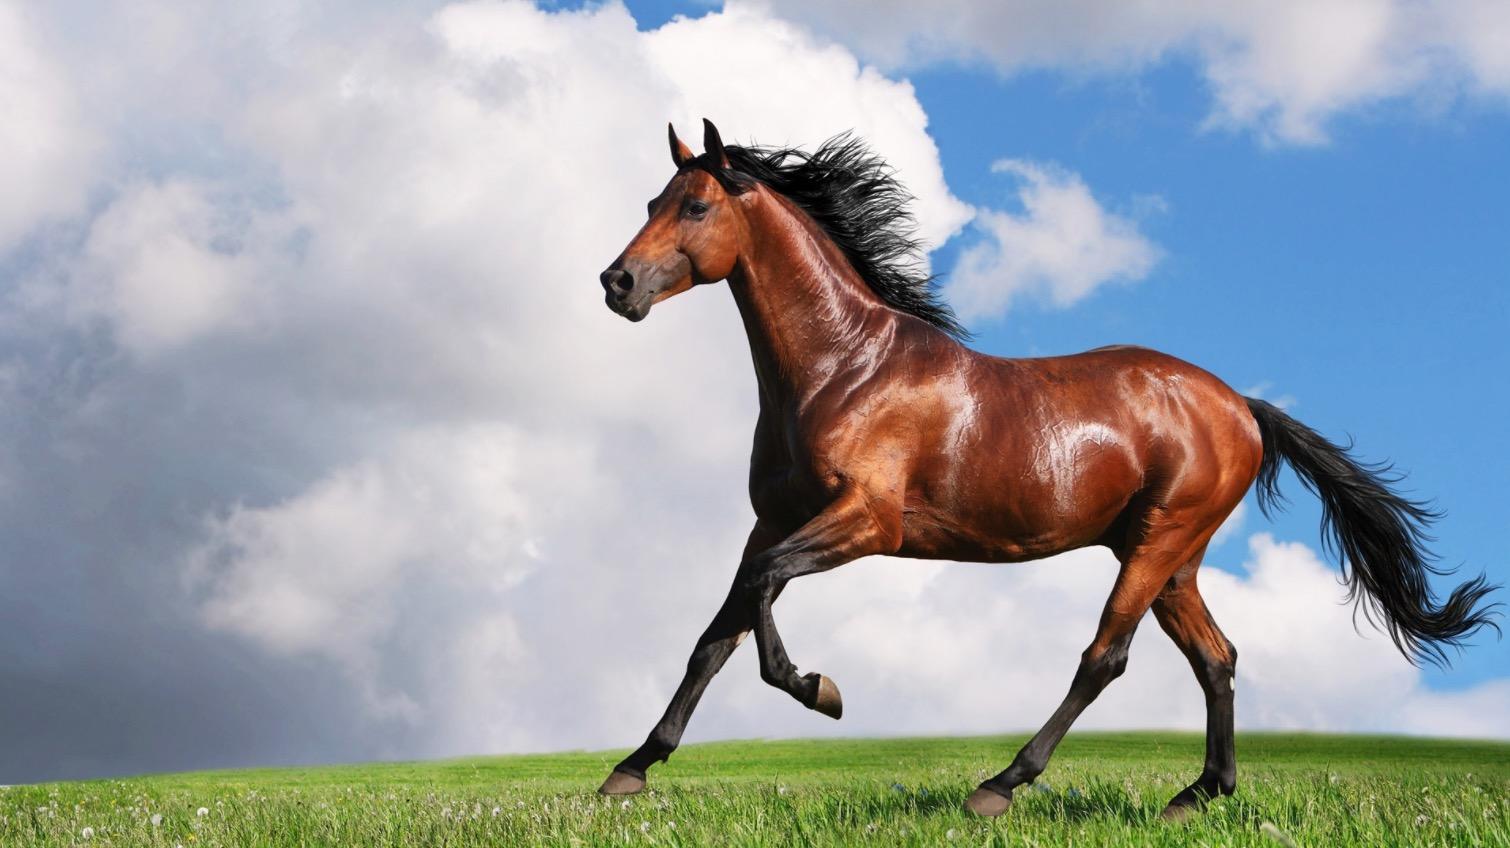 صورة صور حصان , صور احصنه جميلة جدا